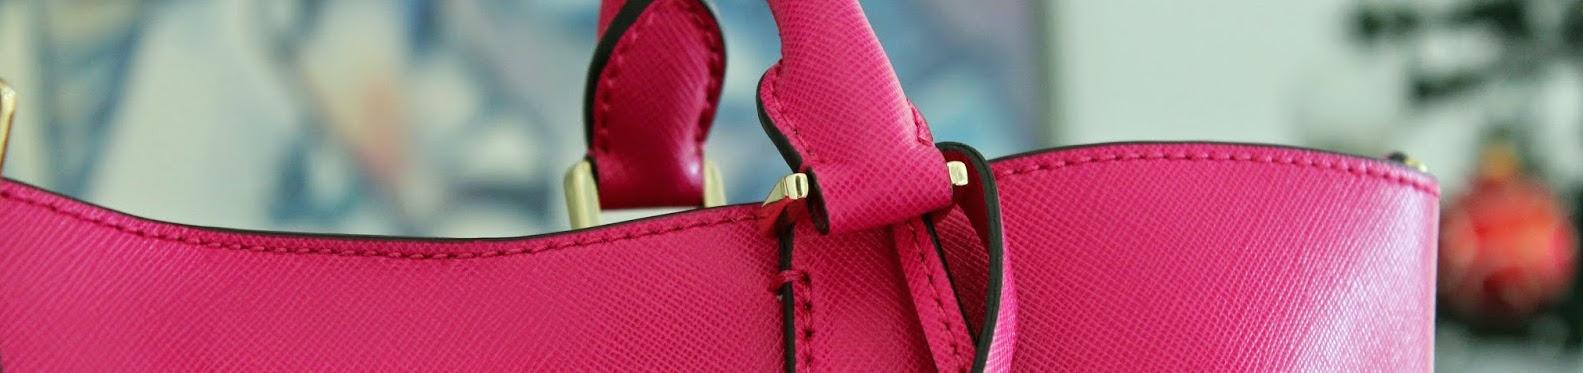 Eniwhere Fashion - Greenwich - Michael Kors 5966